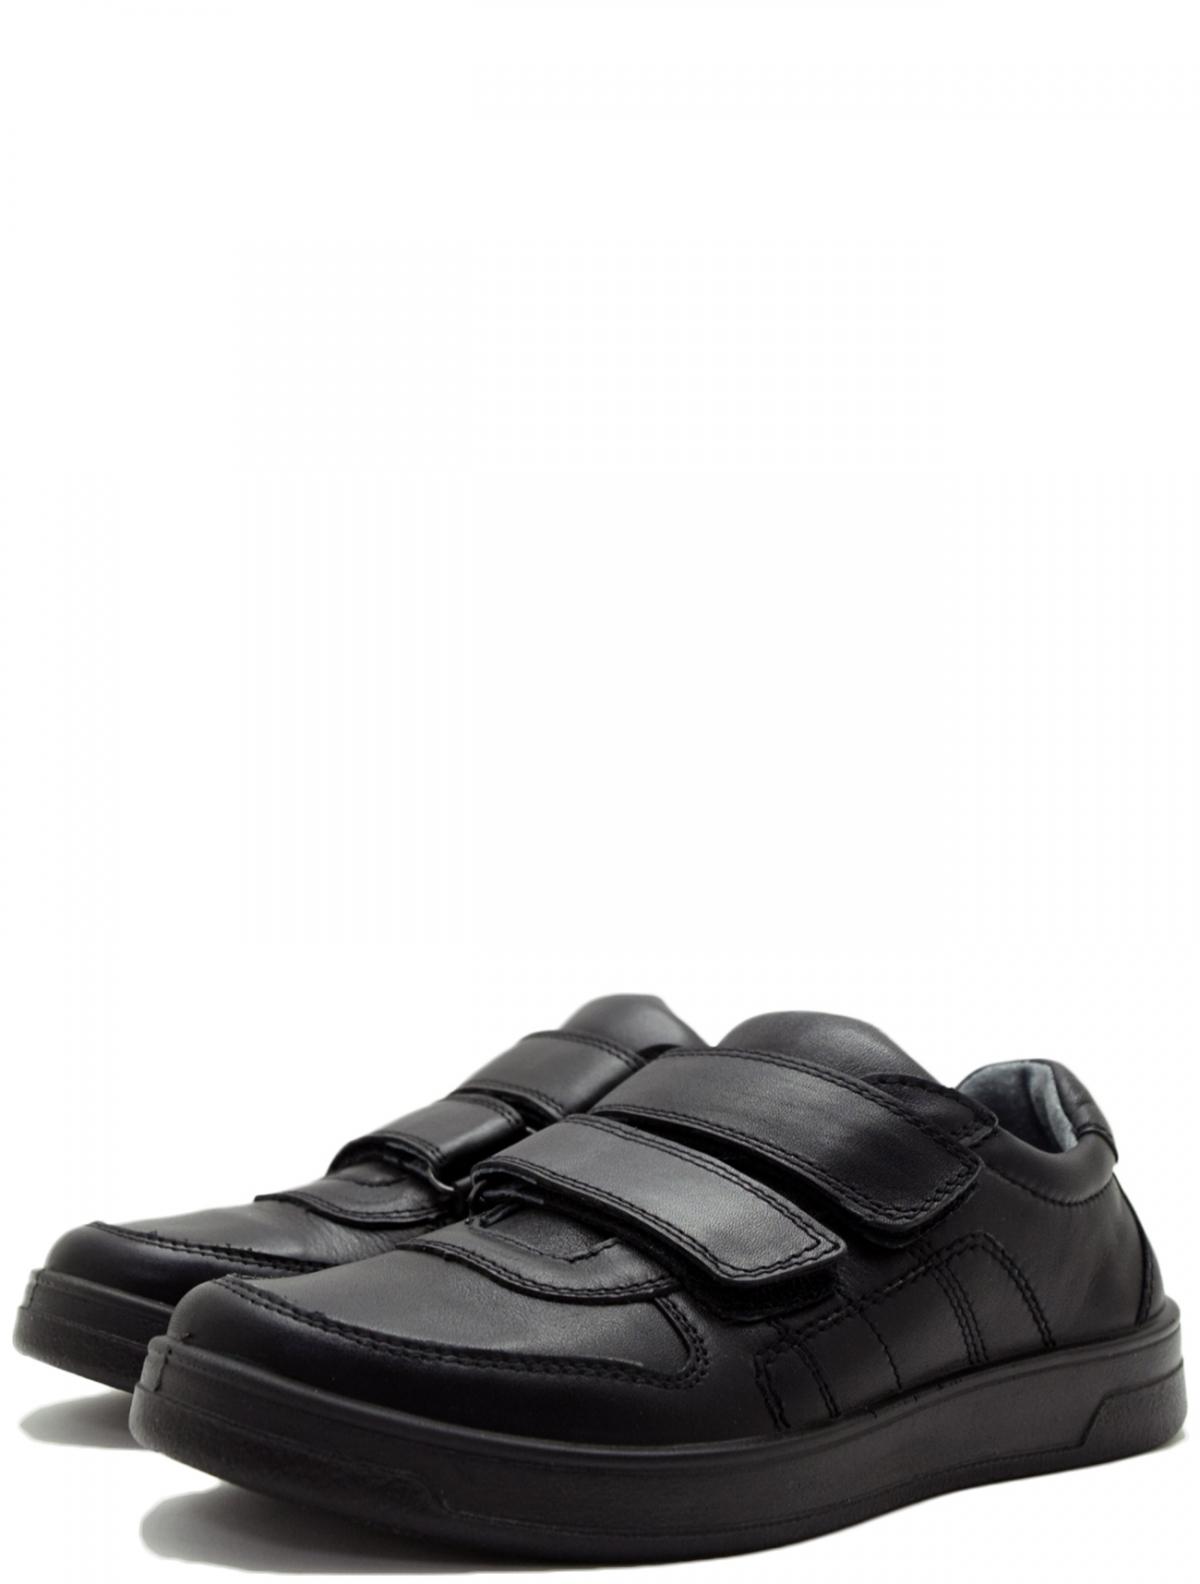 Kenka 2030-11 туфли для мальчика